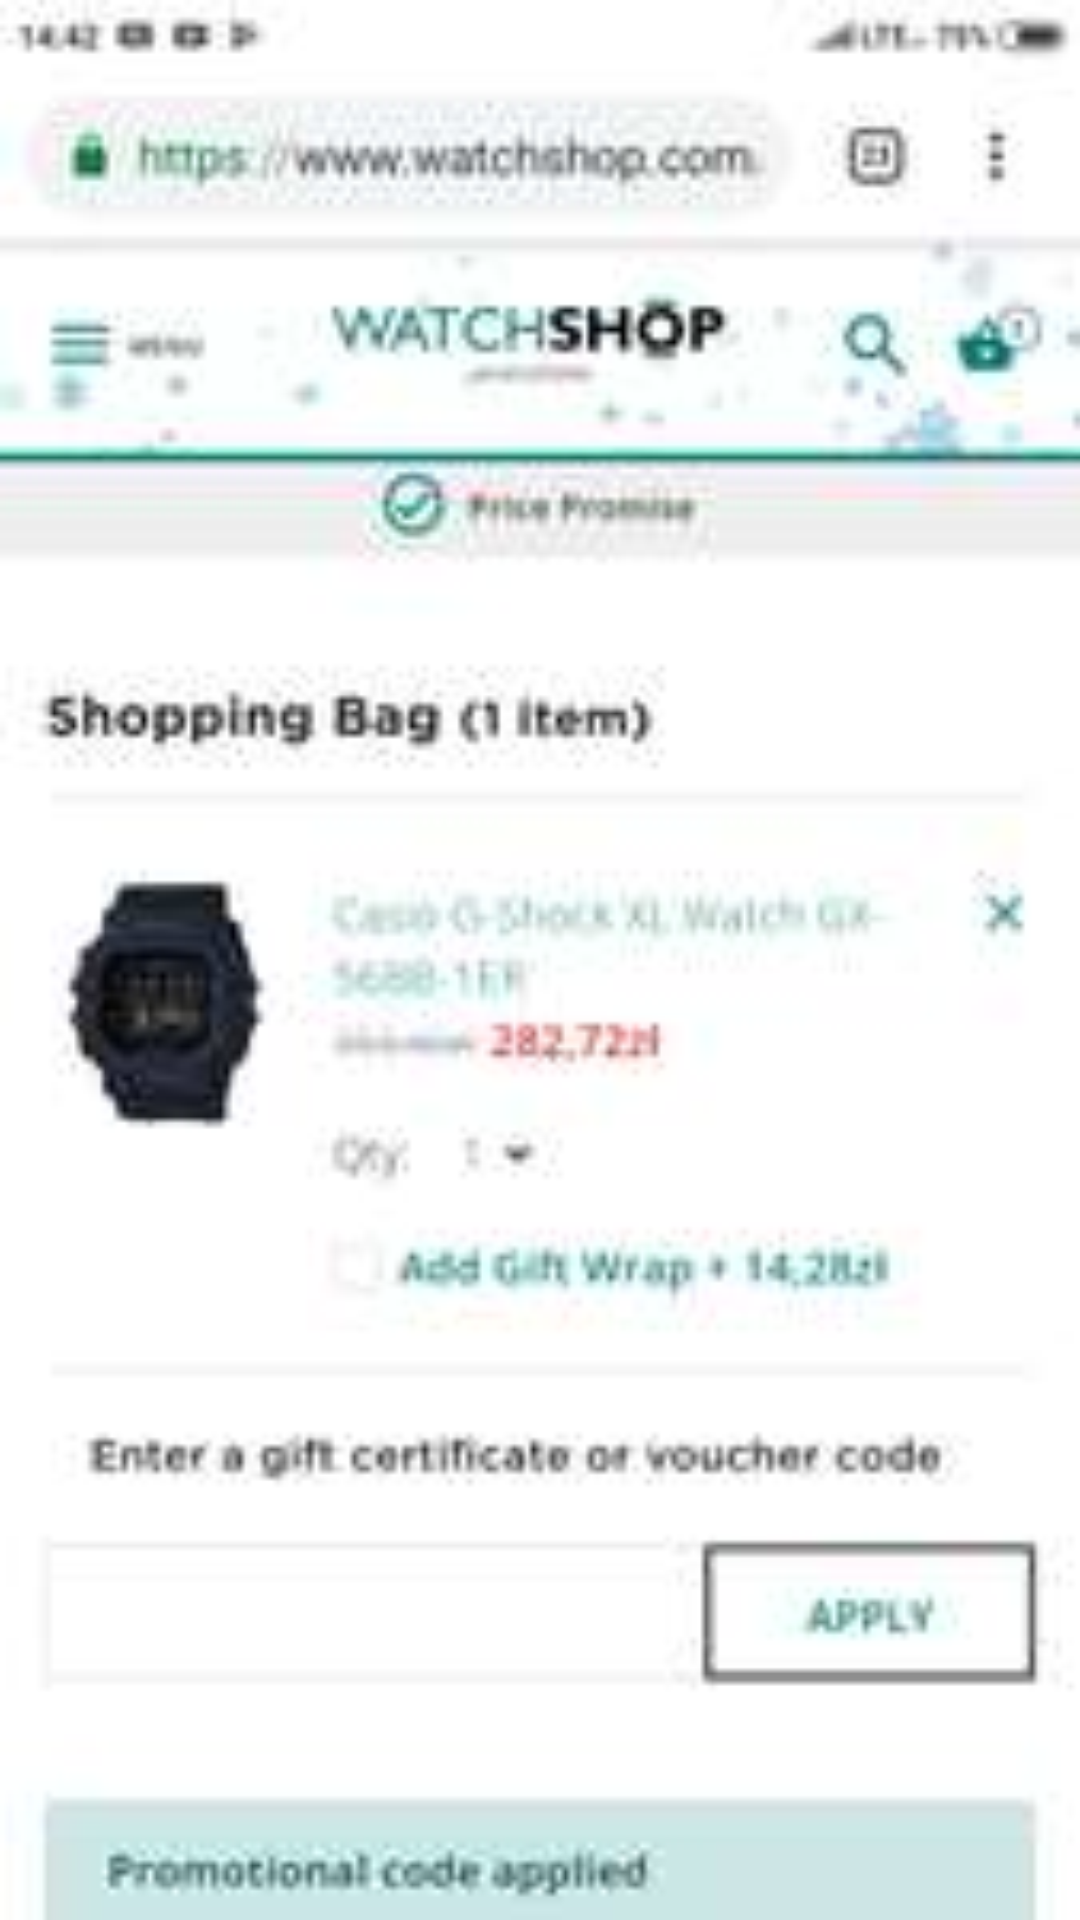 Zegarek Casio G-Shock XL 'KING OF G' GX-56BB-1ER